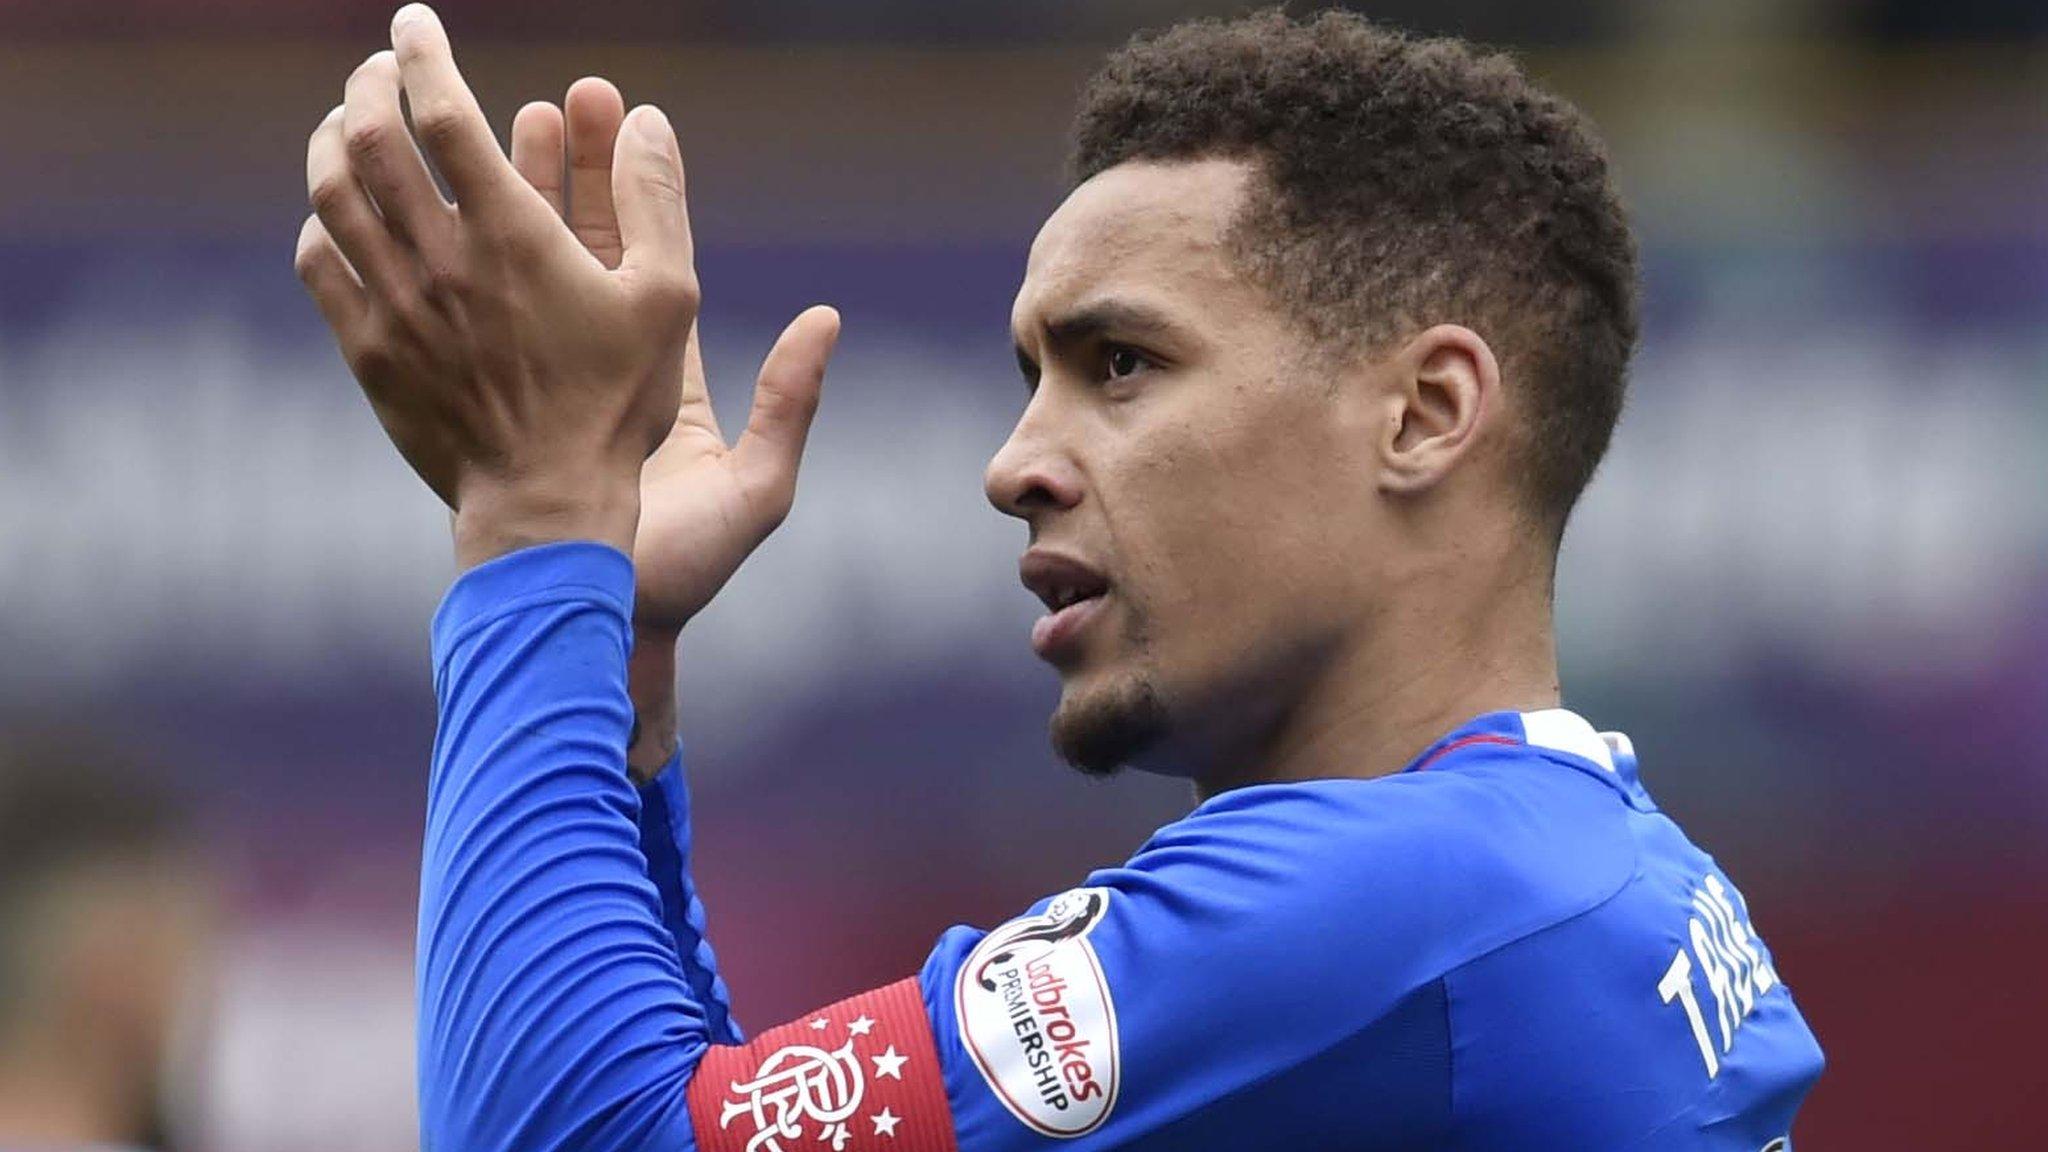 James Tavernier: Police investigate racist abuse of Rangers captain